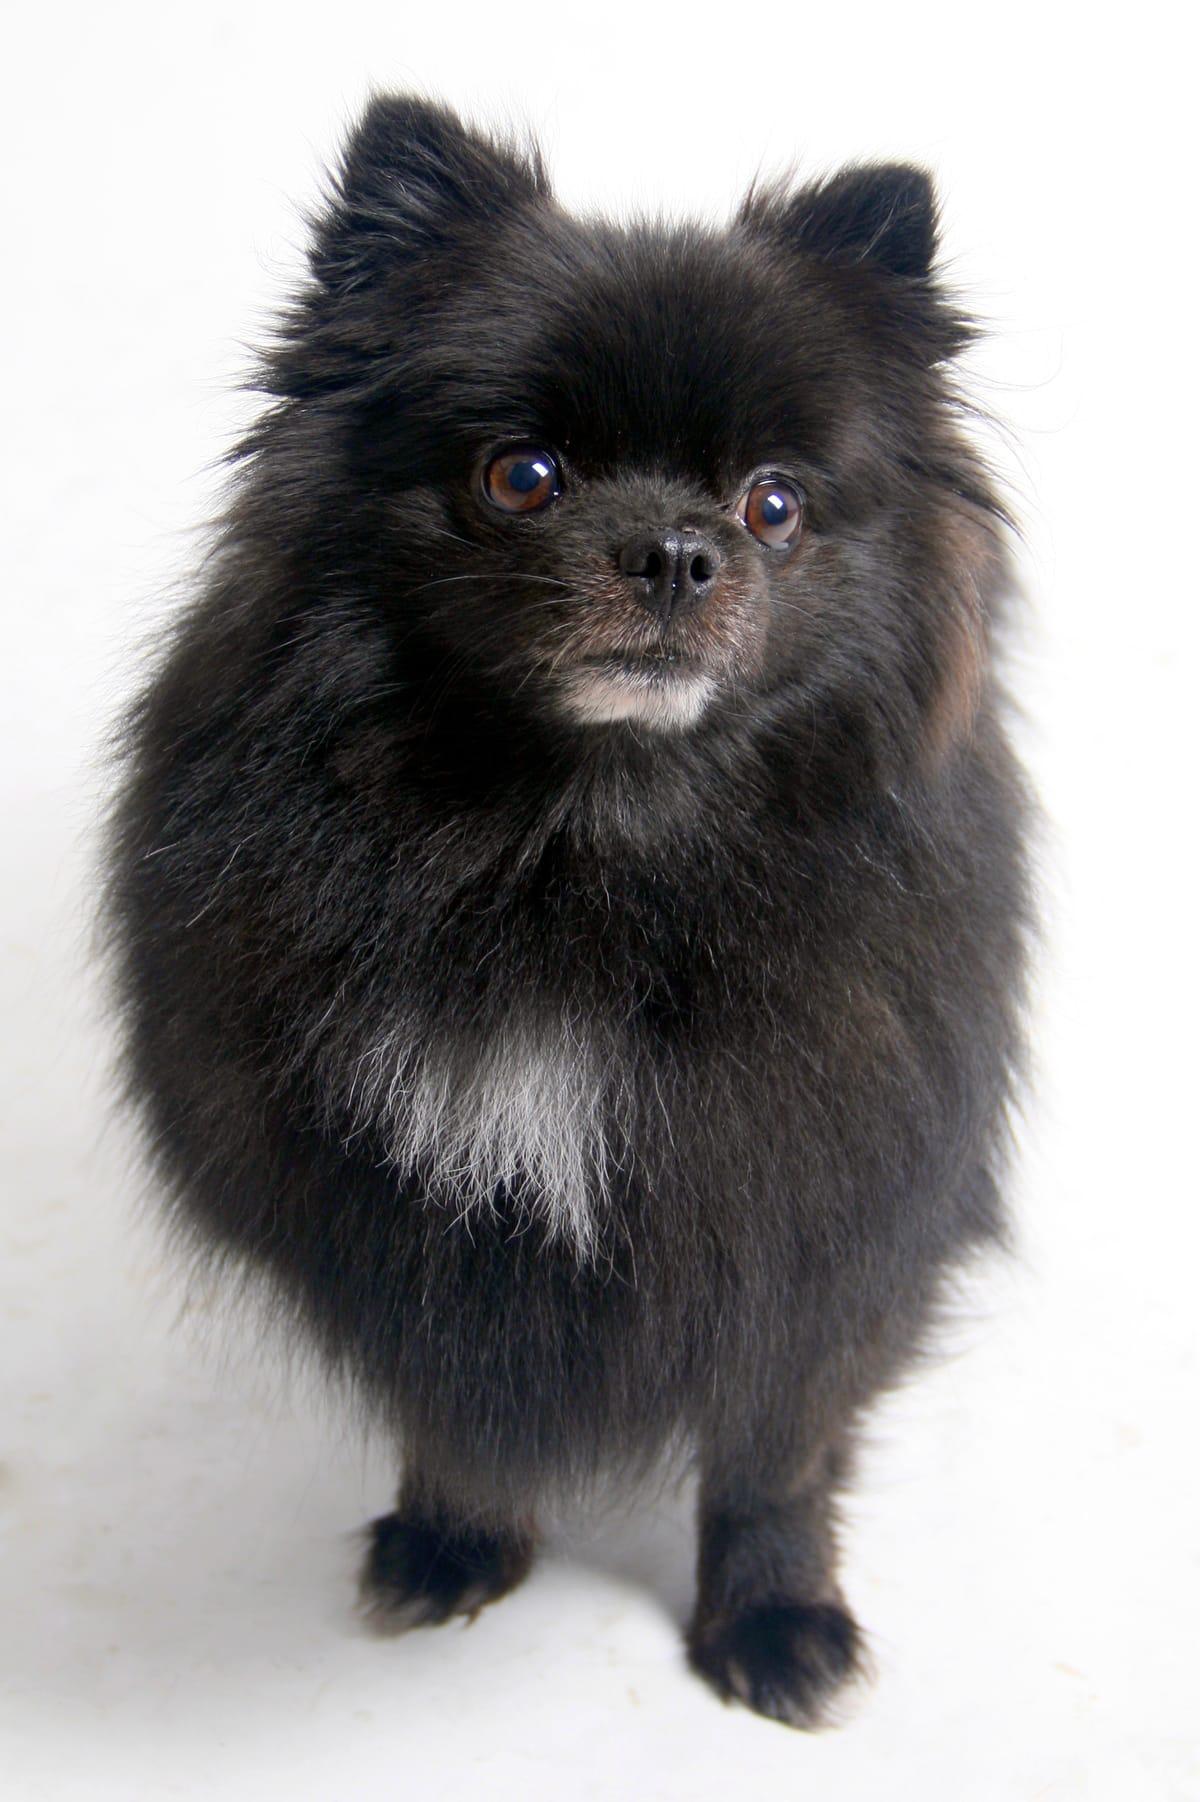 Pomeranian Faces Brighter Future After Life Saving Surgery